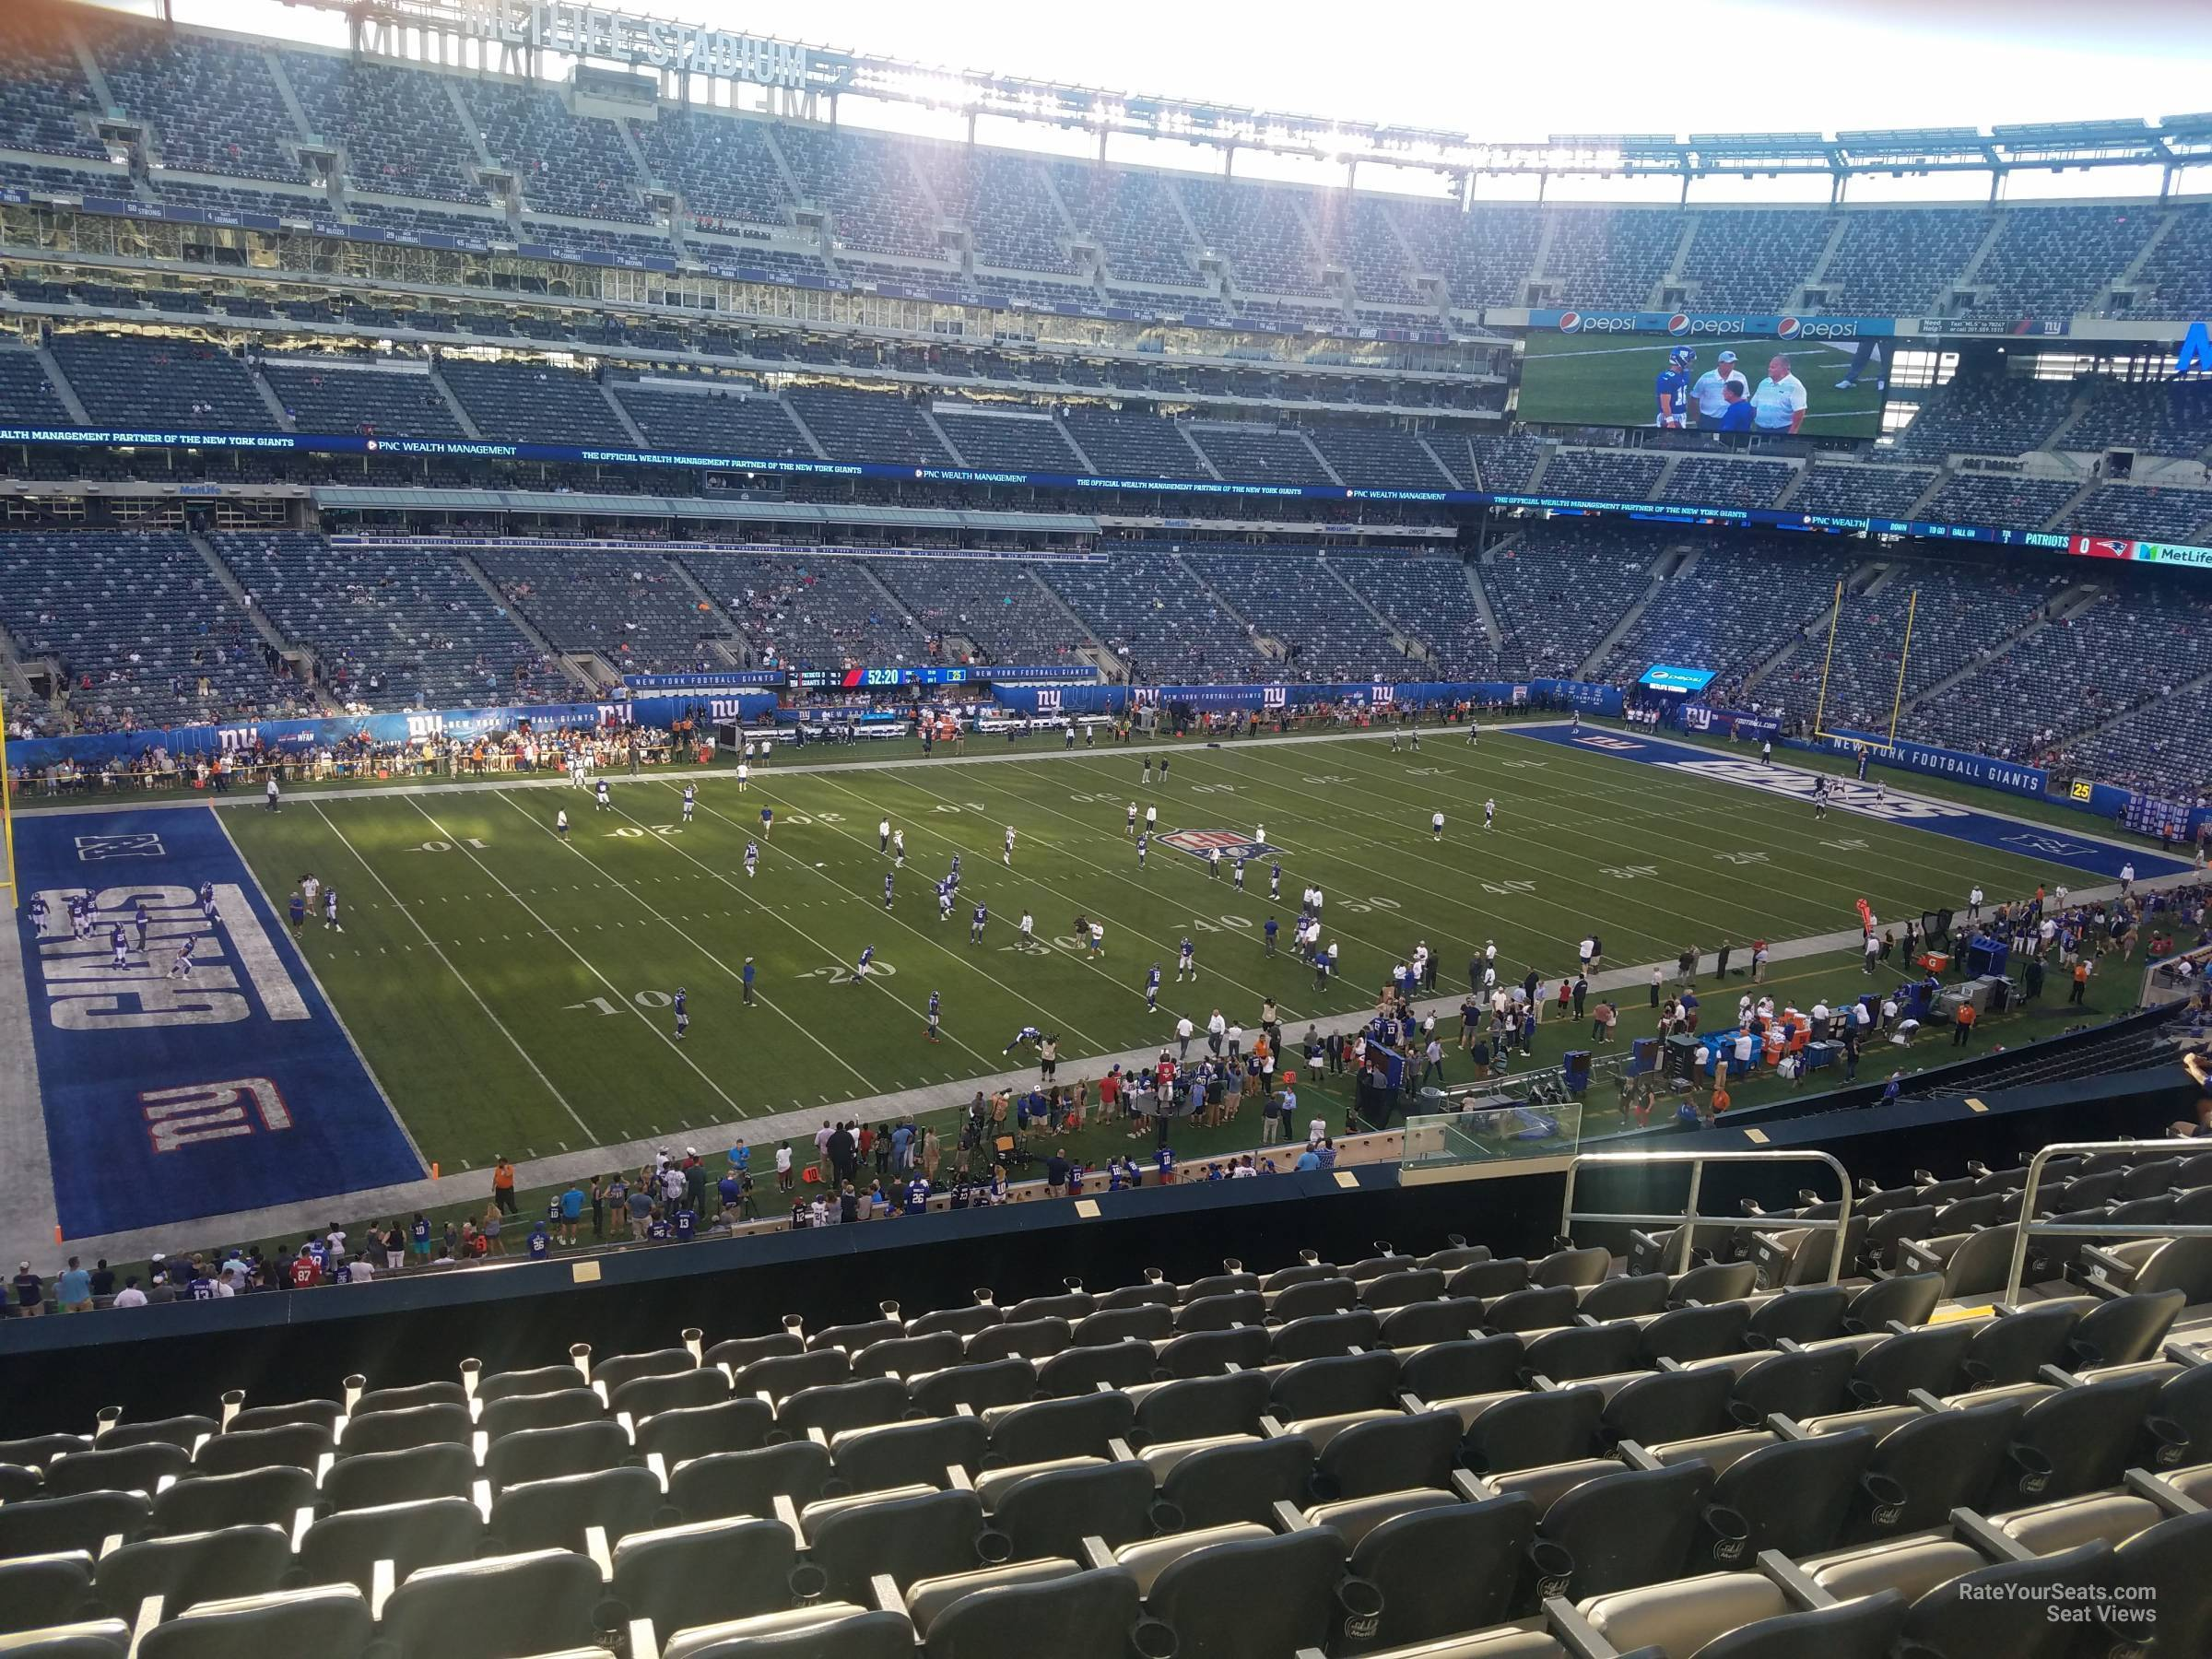 MetLife Stadium Section 218 - Giants Jets - RateYourSeats.com 11b79b068